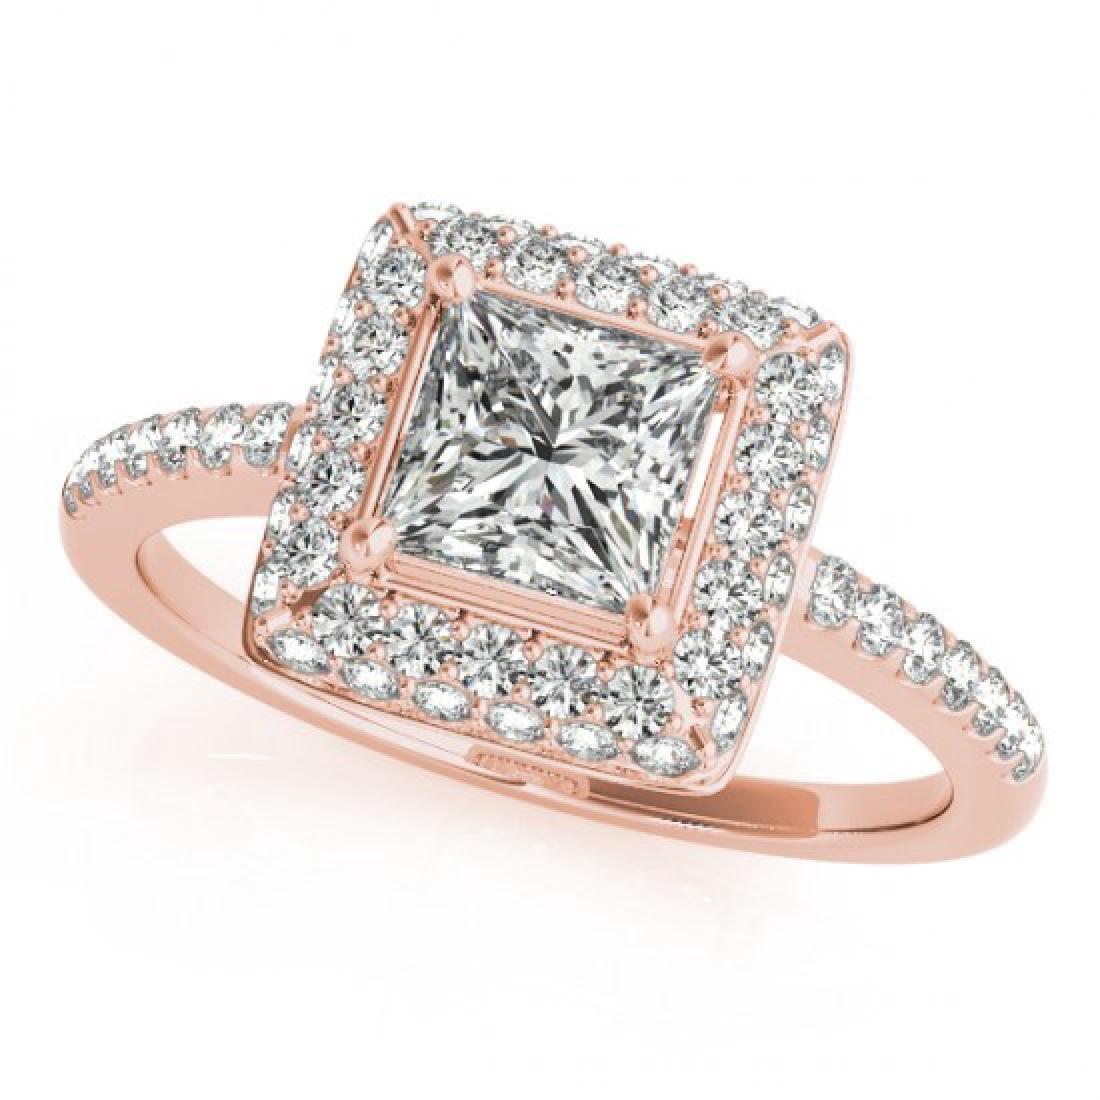 1.50 CTW Certified VS/SI Princess Diamond Solitaire